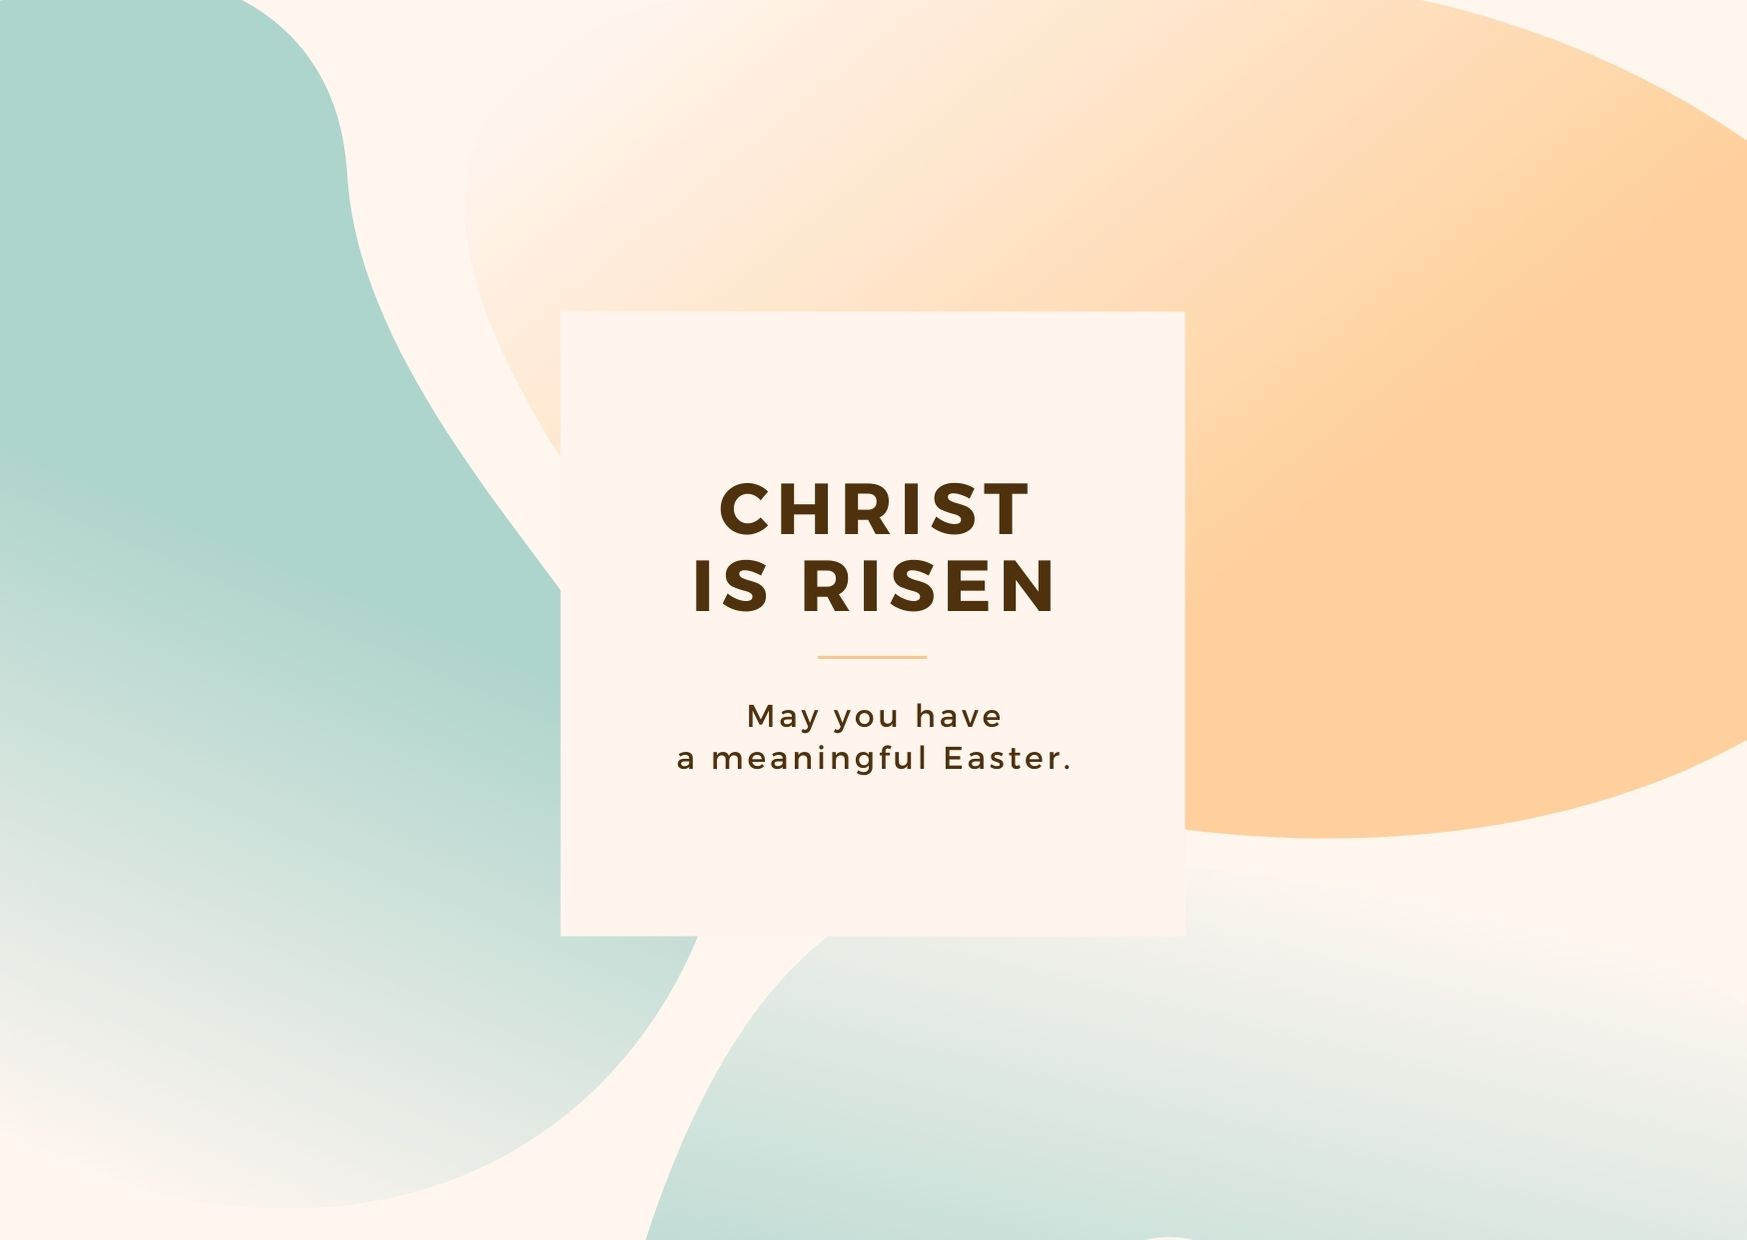 Hari Kebangkitan, Ini 10 Inspirasi Ucapan Selamat Paskah